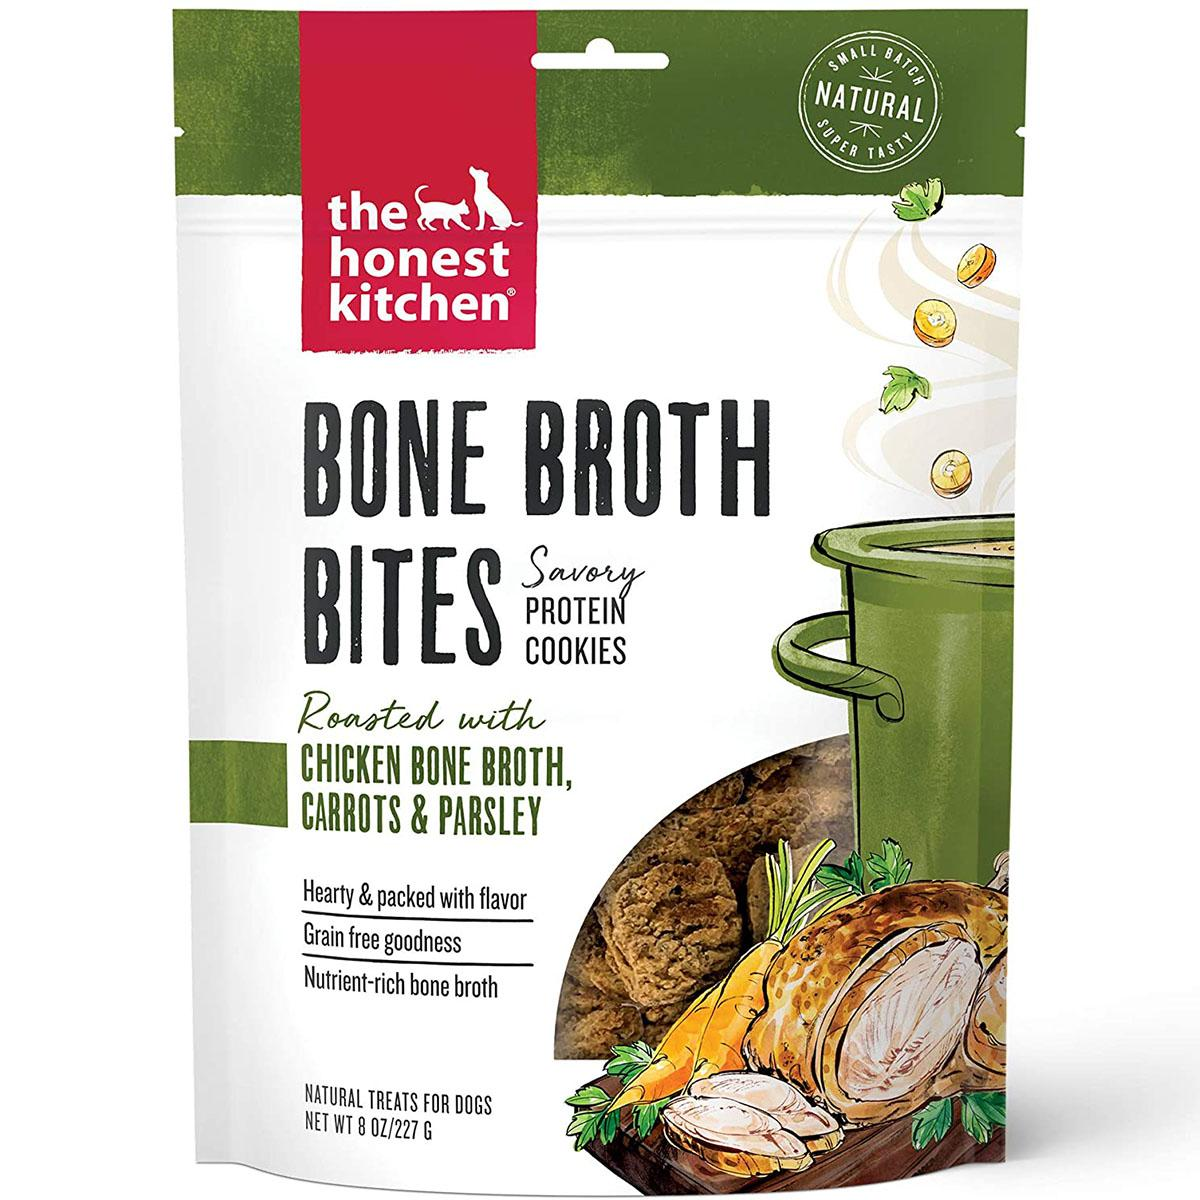 The Honest Kitchen Bone Broth Bites Dog Treats - Chicken Bone Broth, Carrots & Parsley Recipe